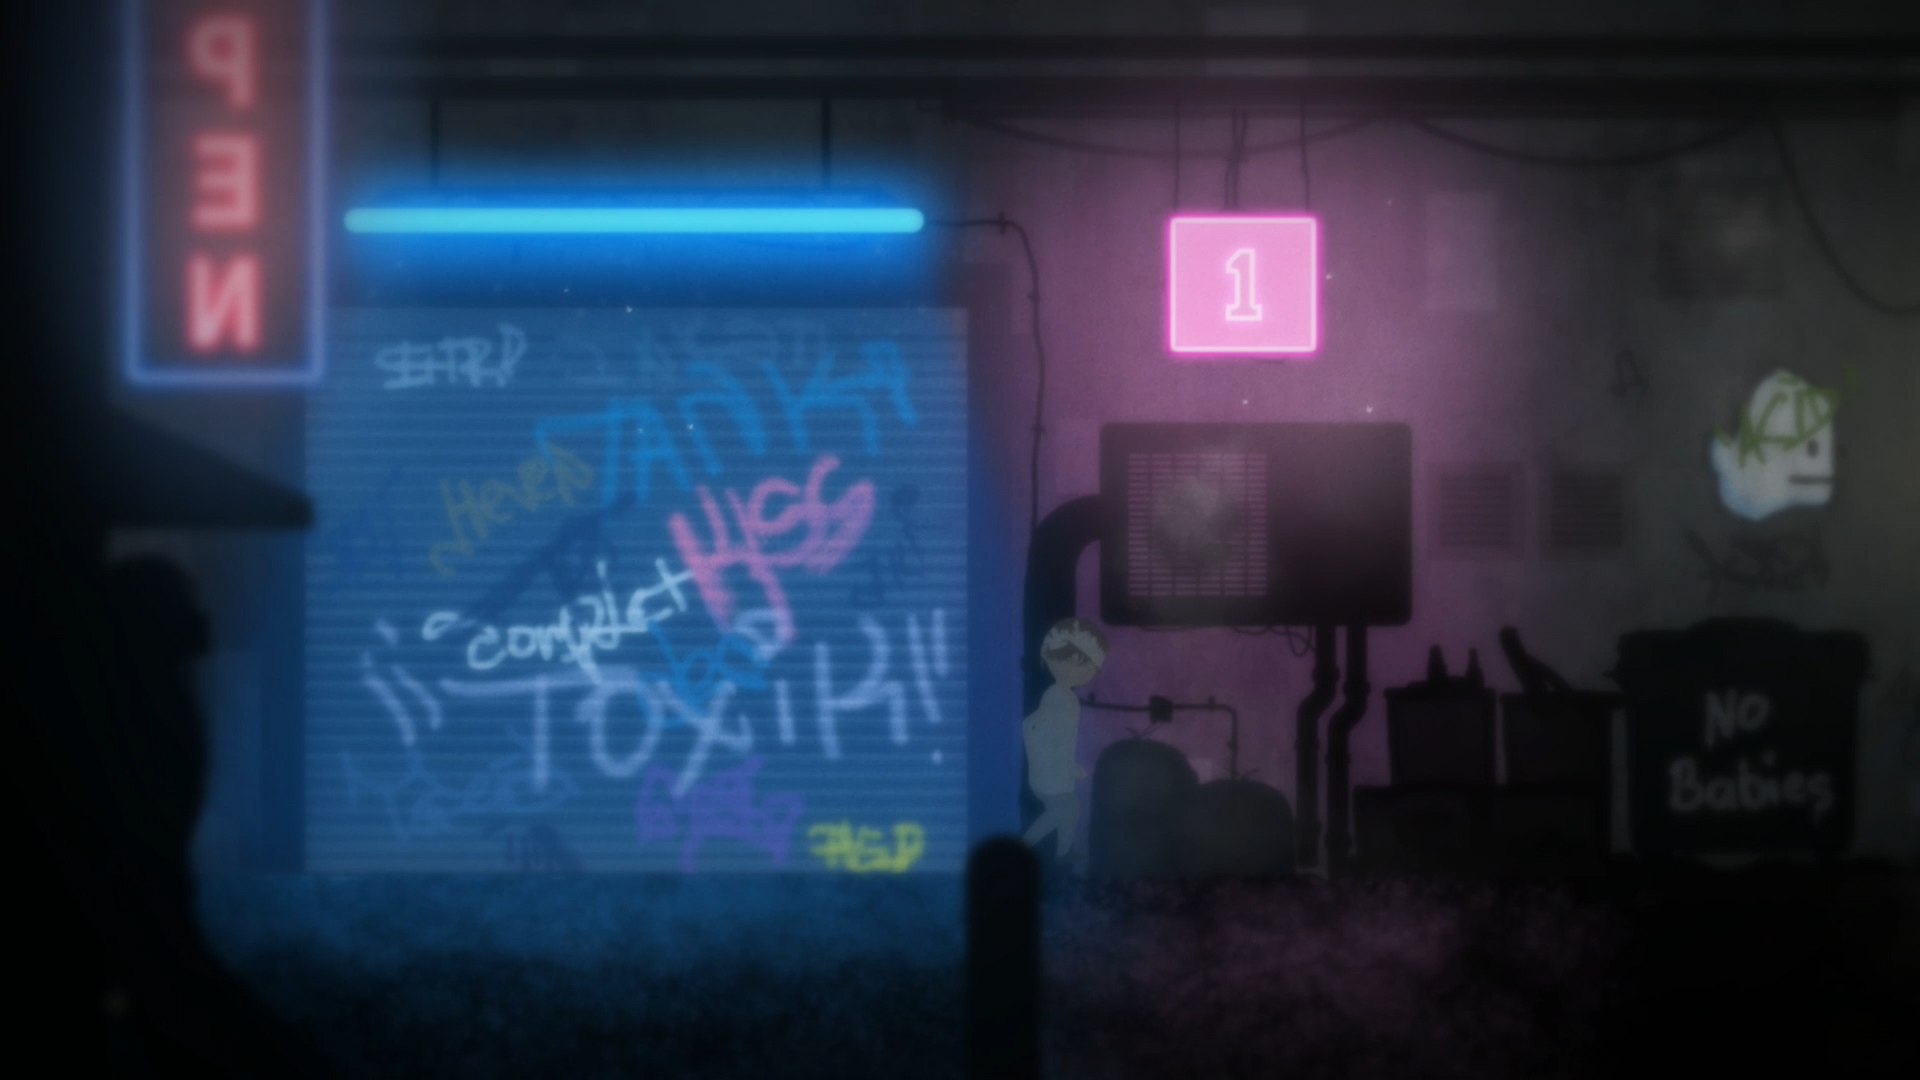 INSANE - Cyberpunk video preview